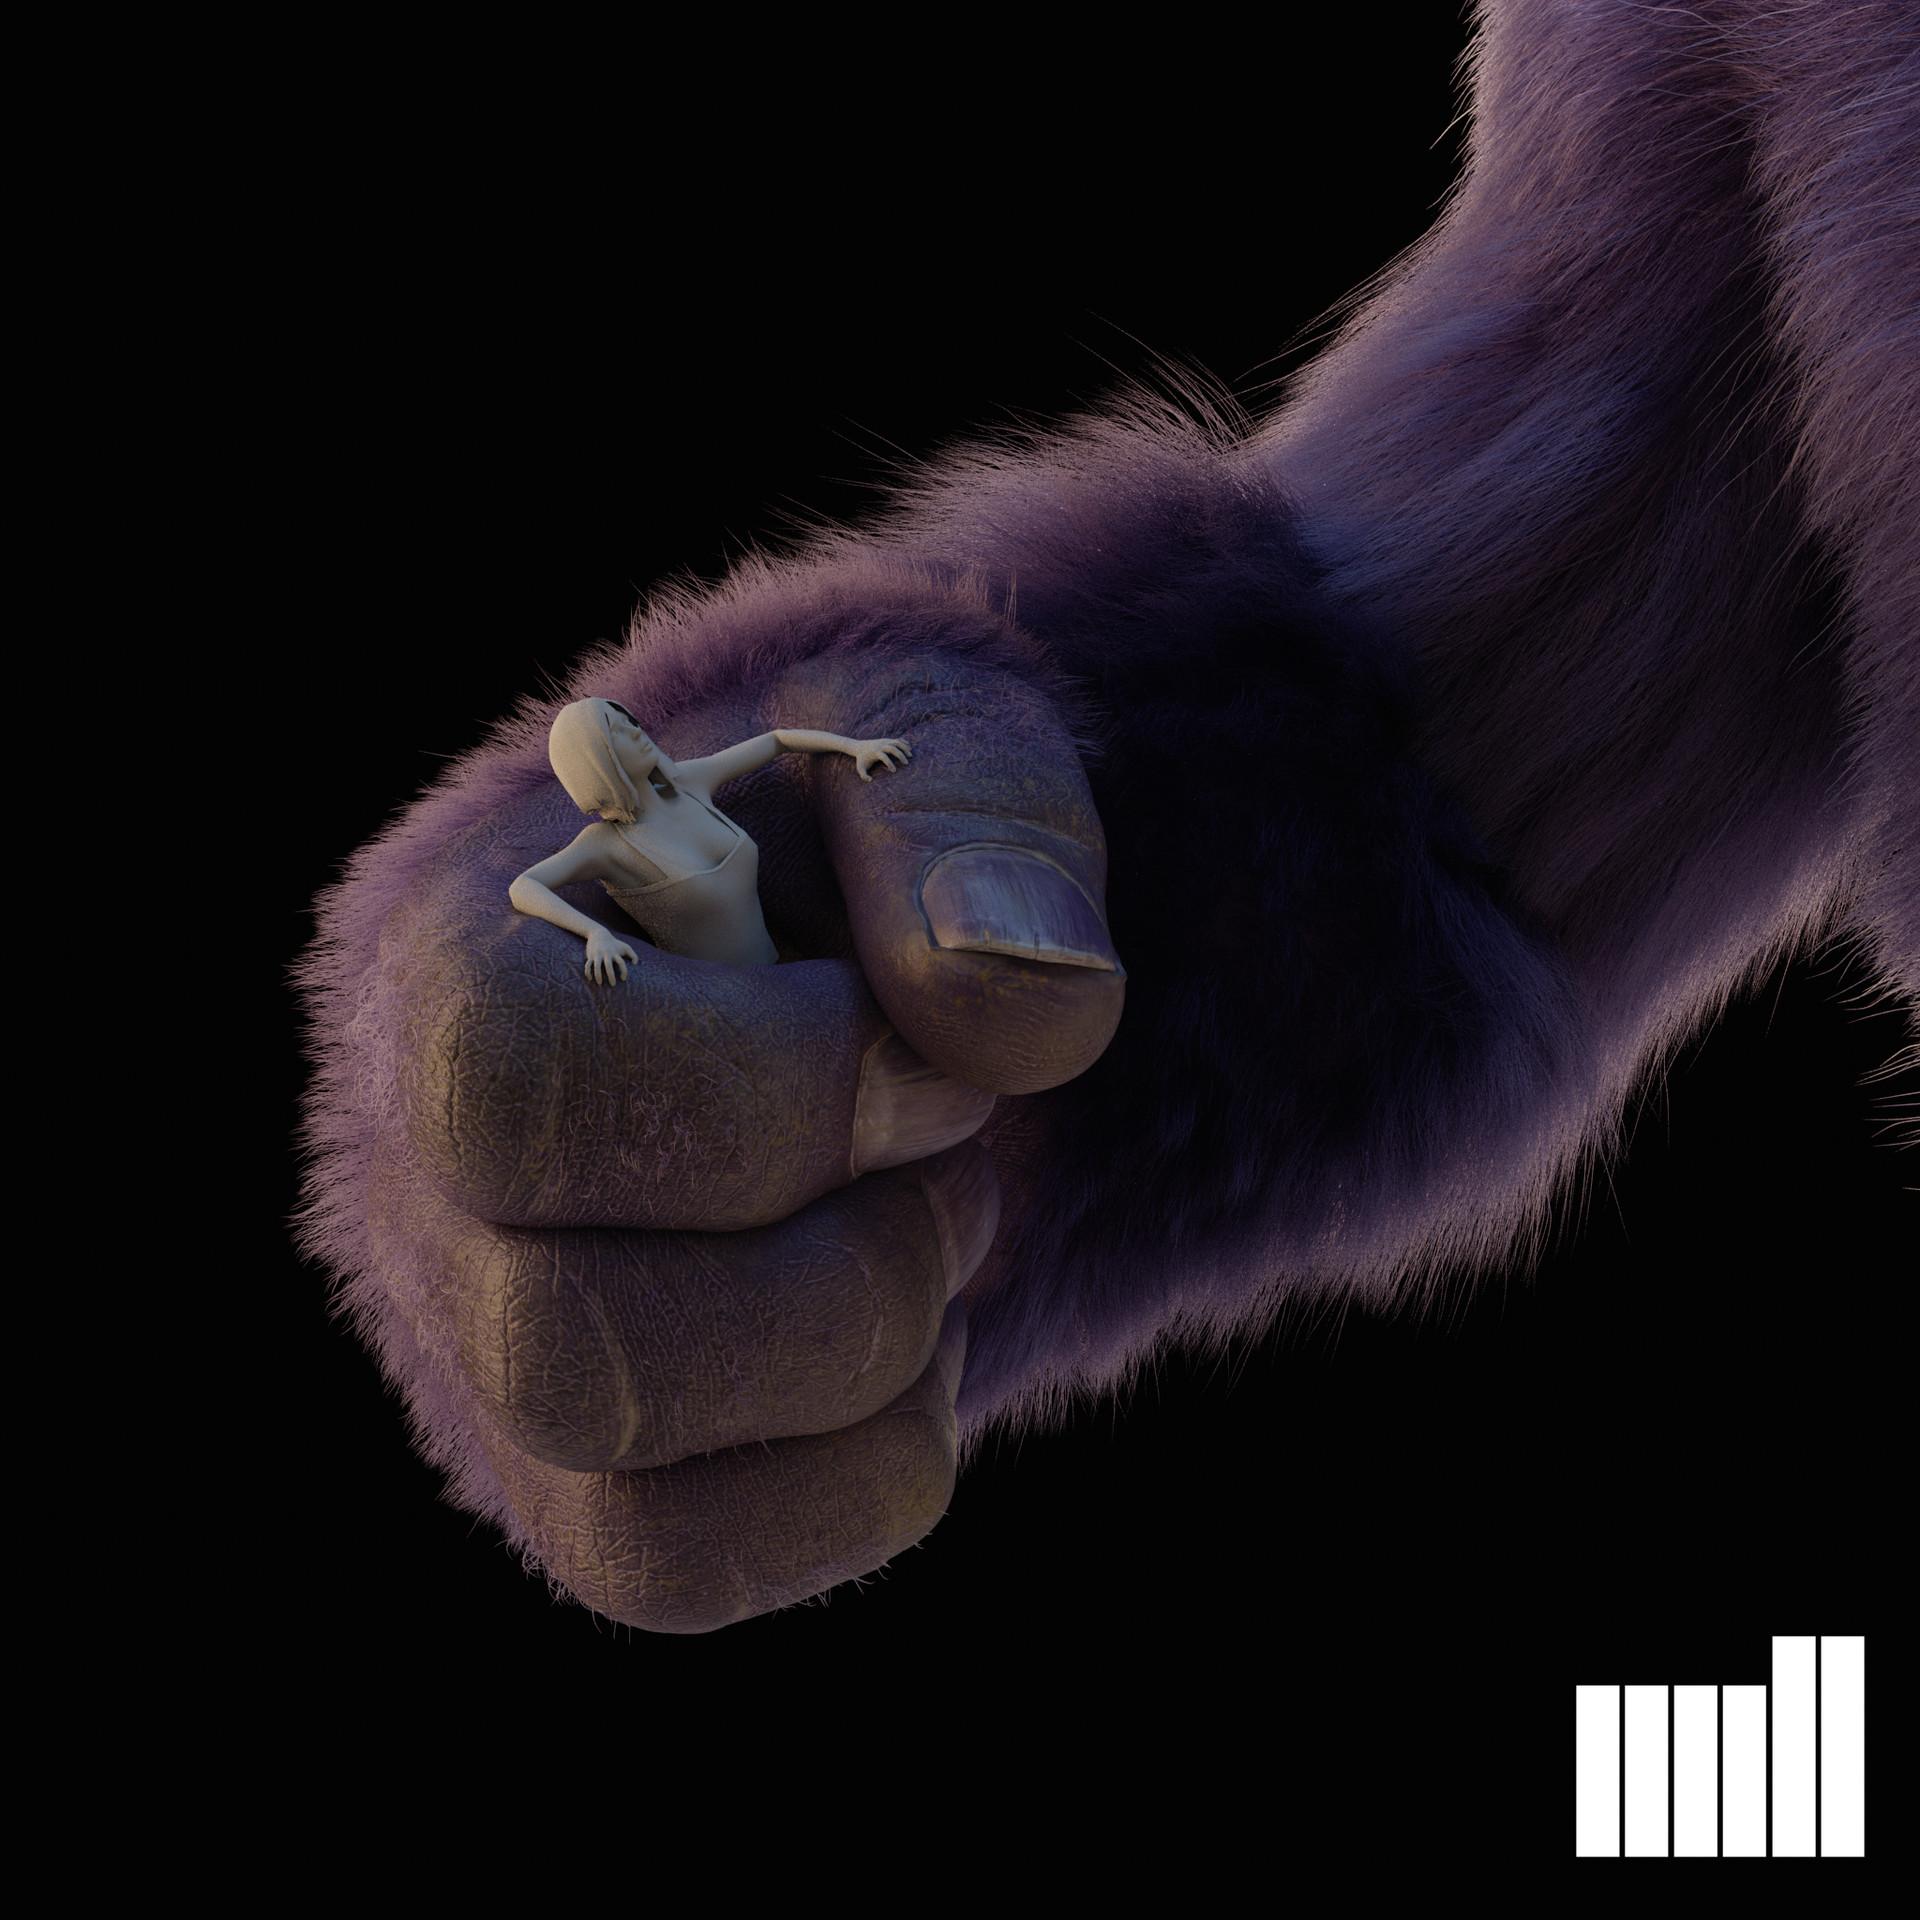 Krystal sae eua build monster handscomp v003 1